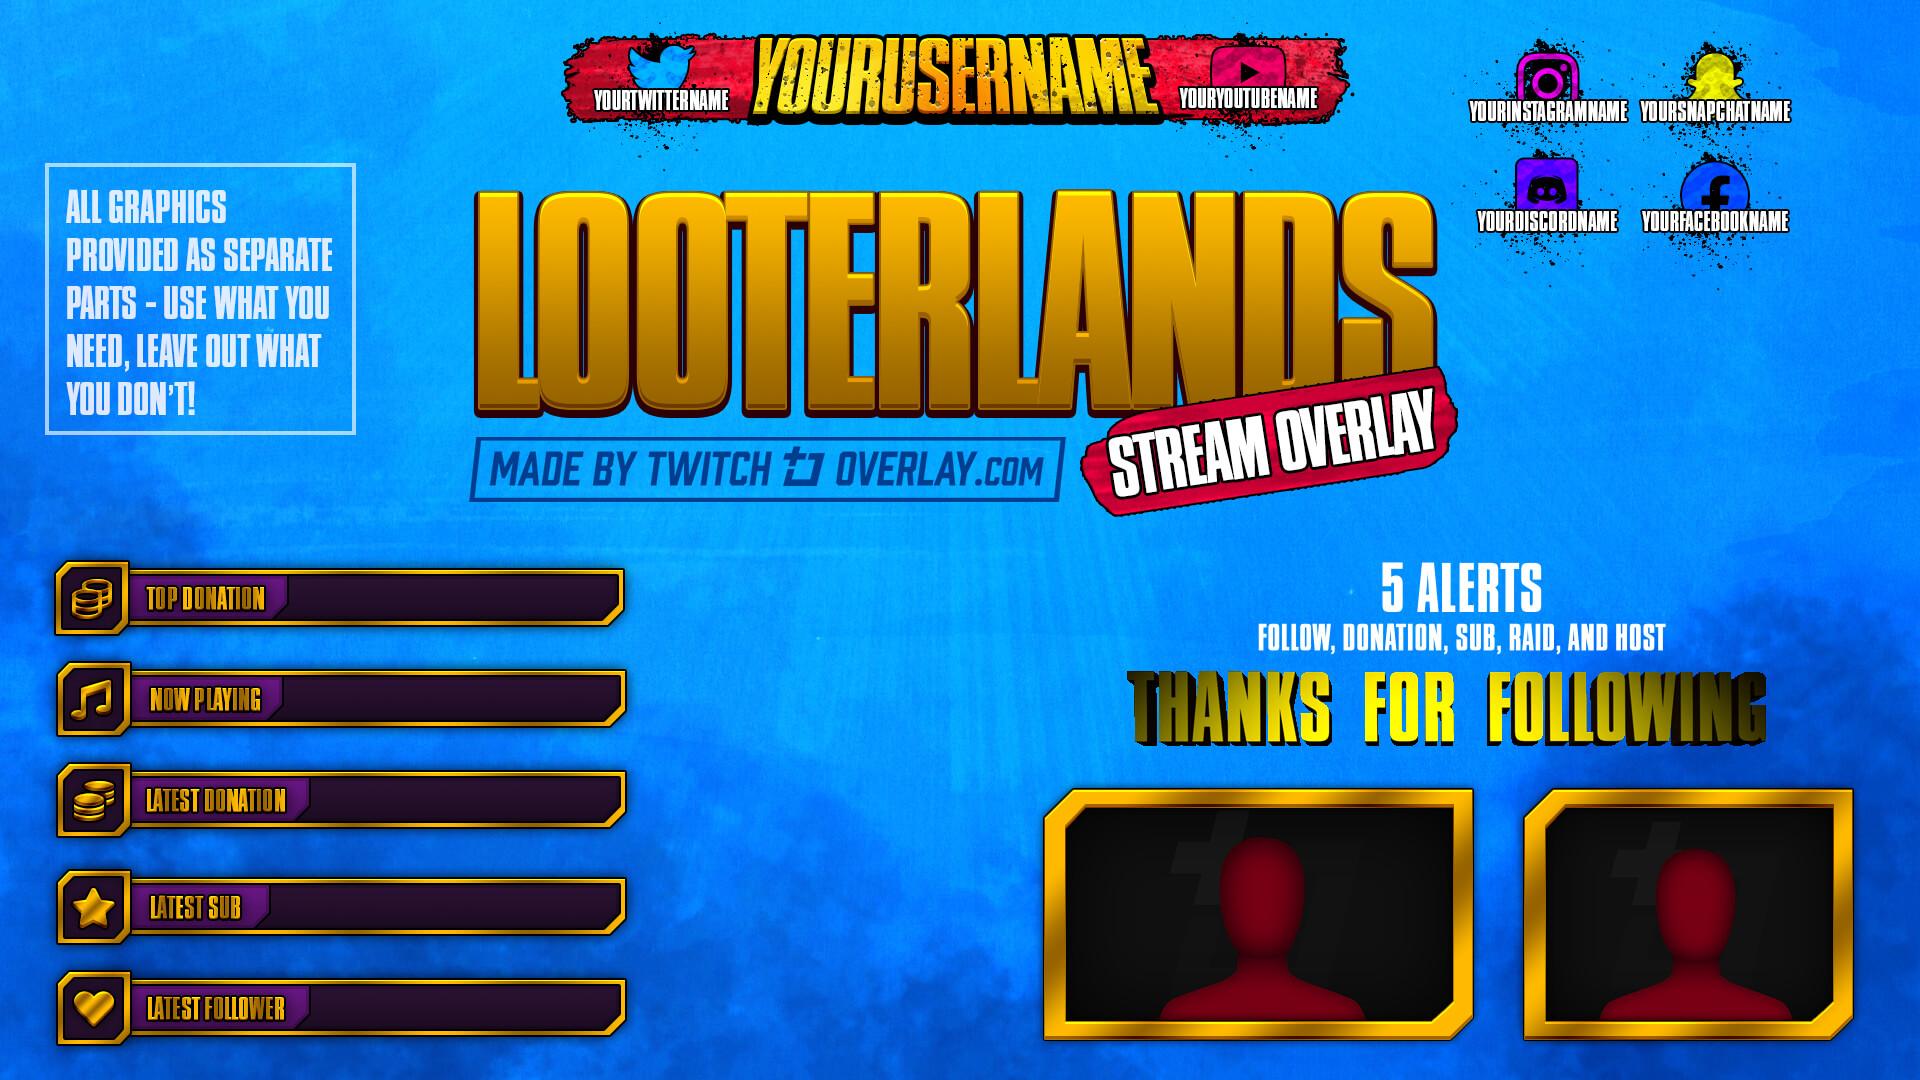 Borderlands 3 twitch overlay - Twitch Overlay